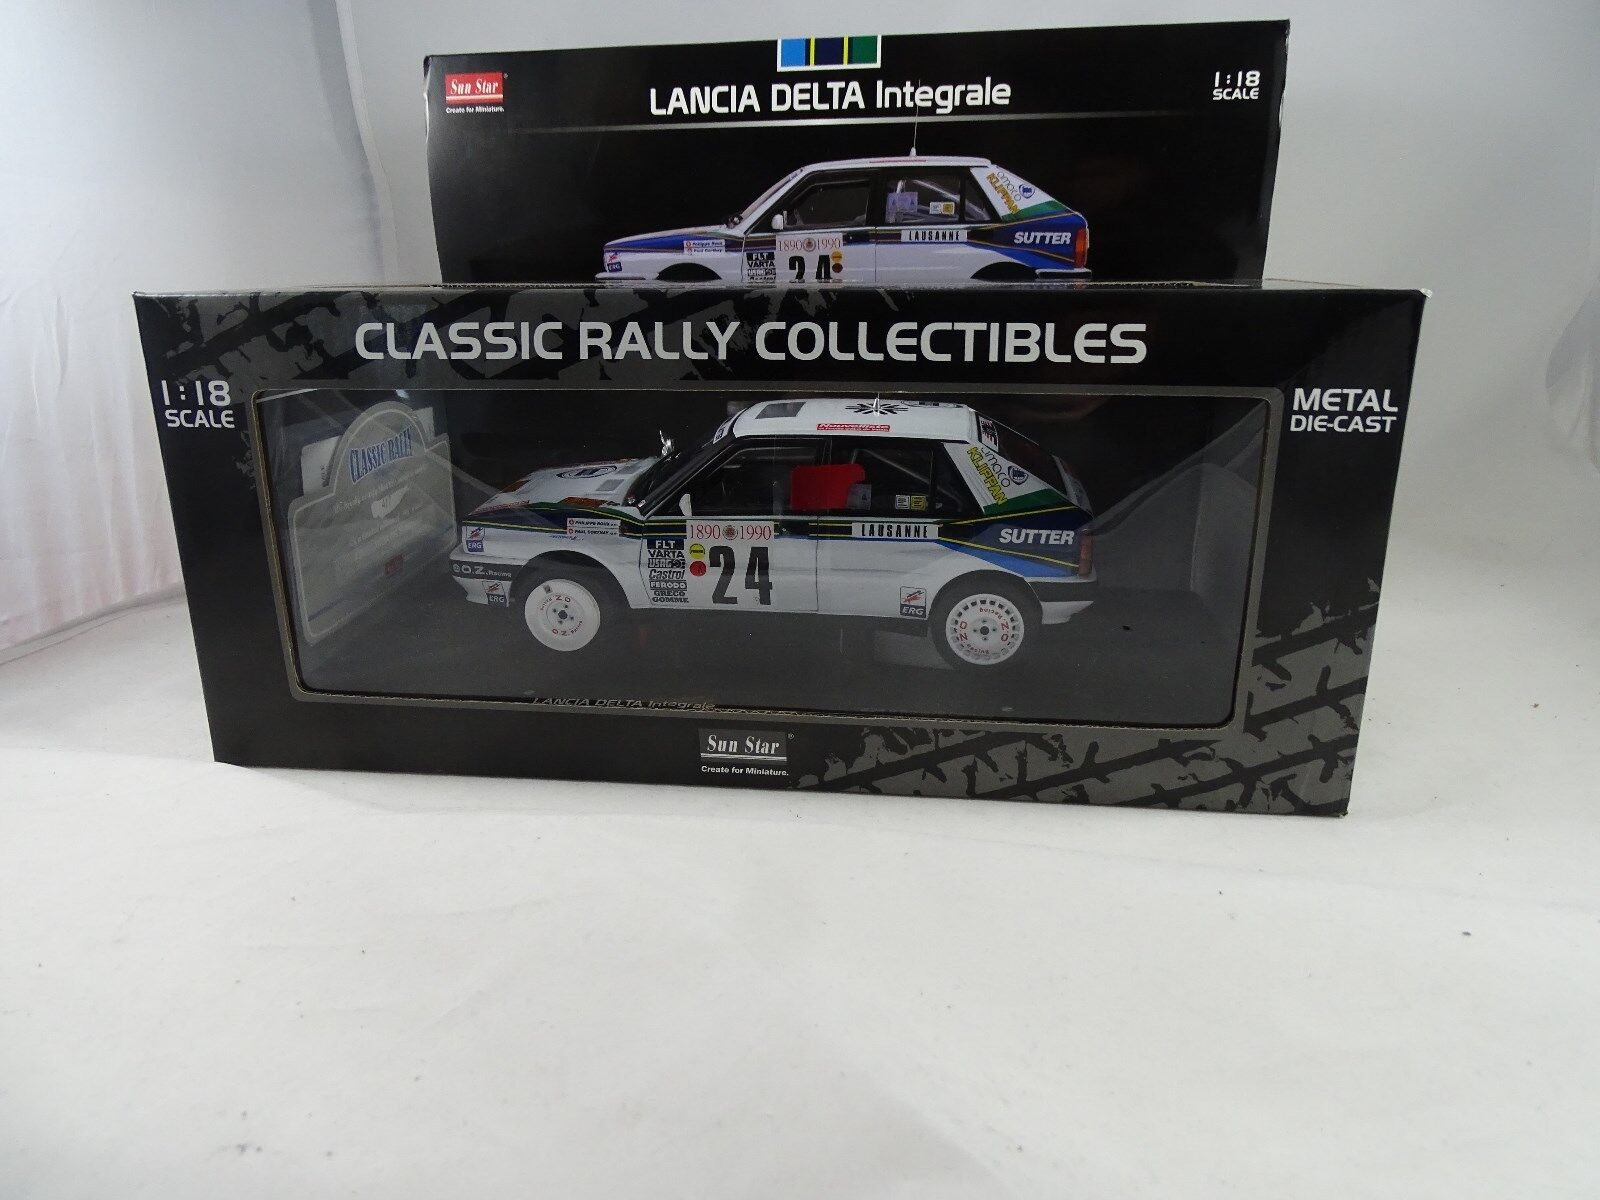 1 18 Sunstar Lancia Delta Integrale   24 Monte voiturelo Rally 1990-Rarity §  offre spéciale